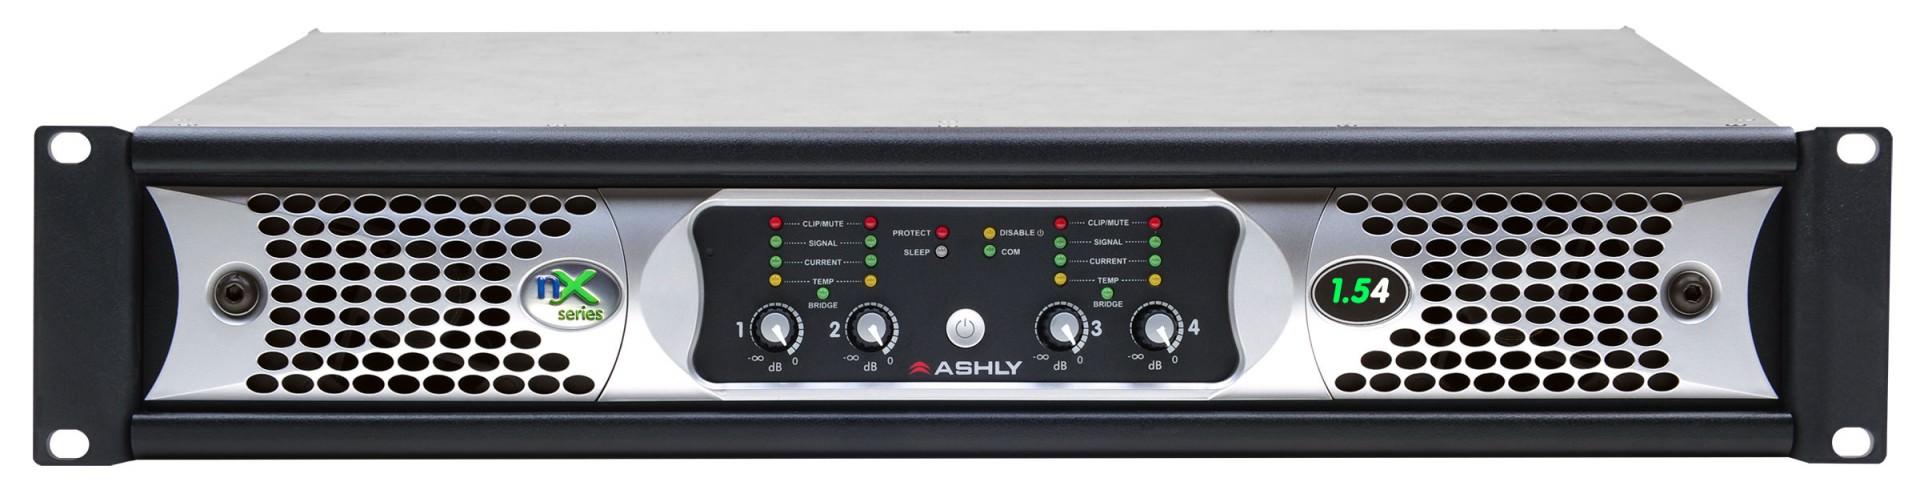 Listed By Alpha Numeric Ashly Audio 1500 Watt High Power Amplifier Nx 152 2 X 1500w Data Sheet Manual Front